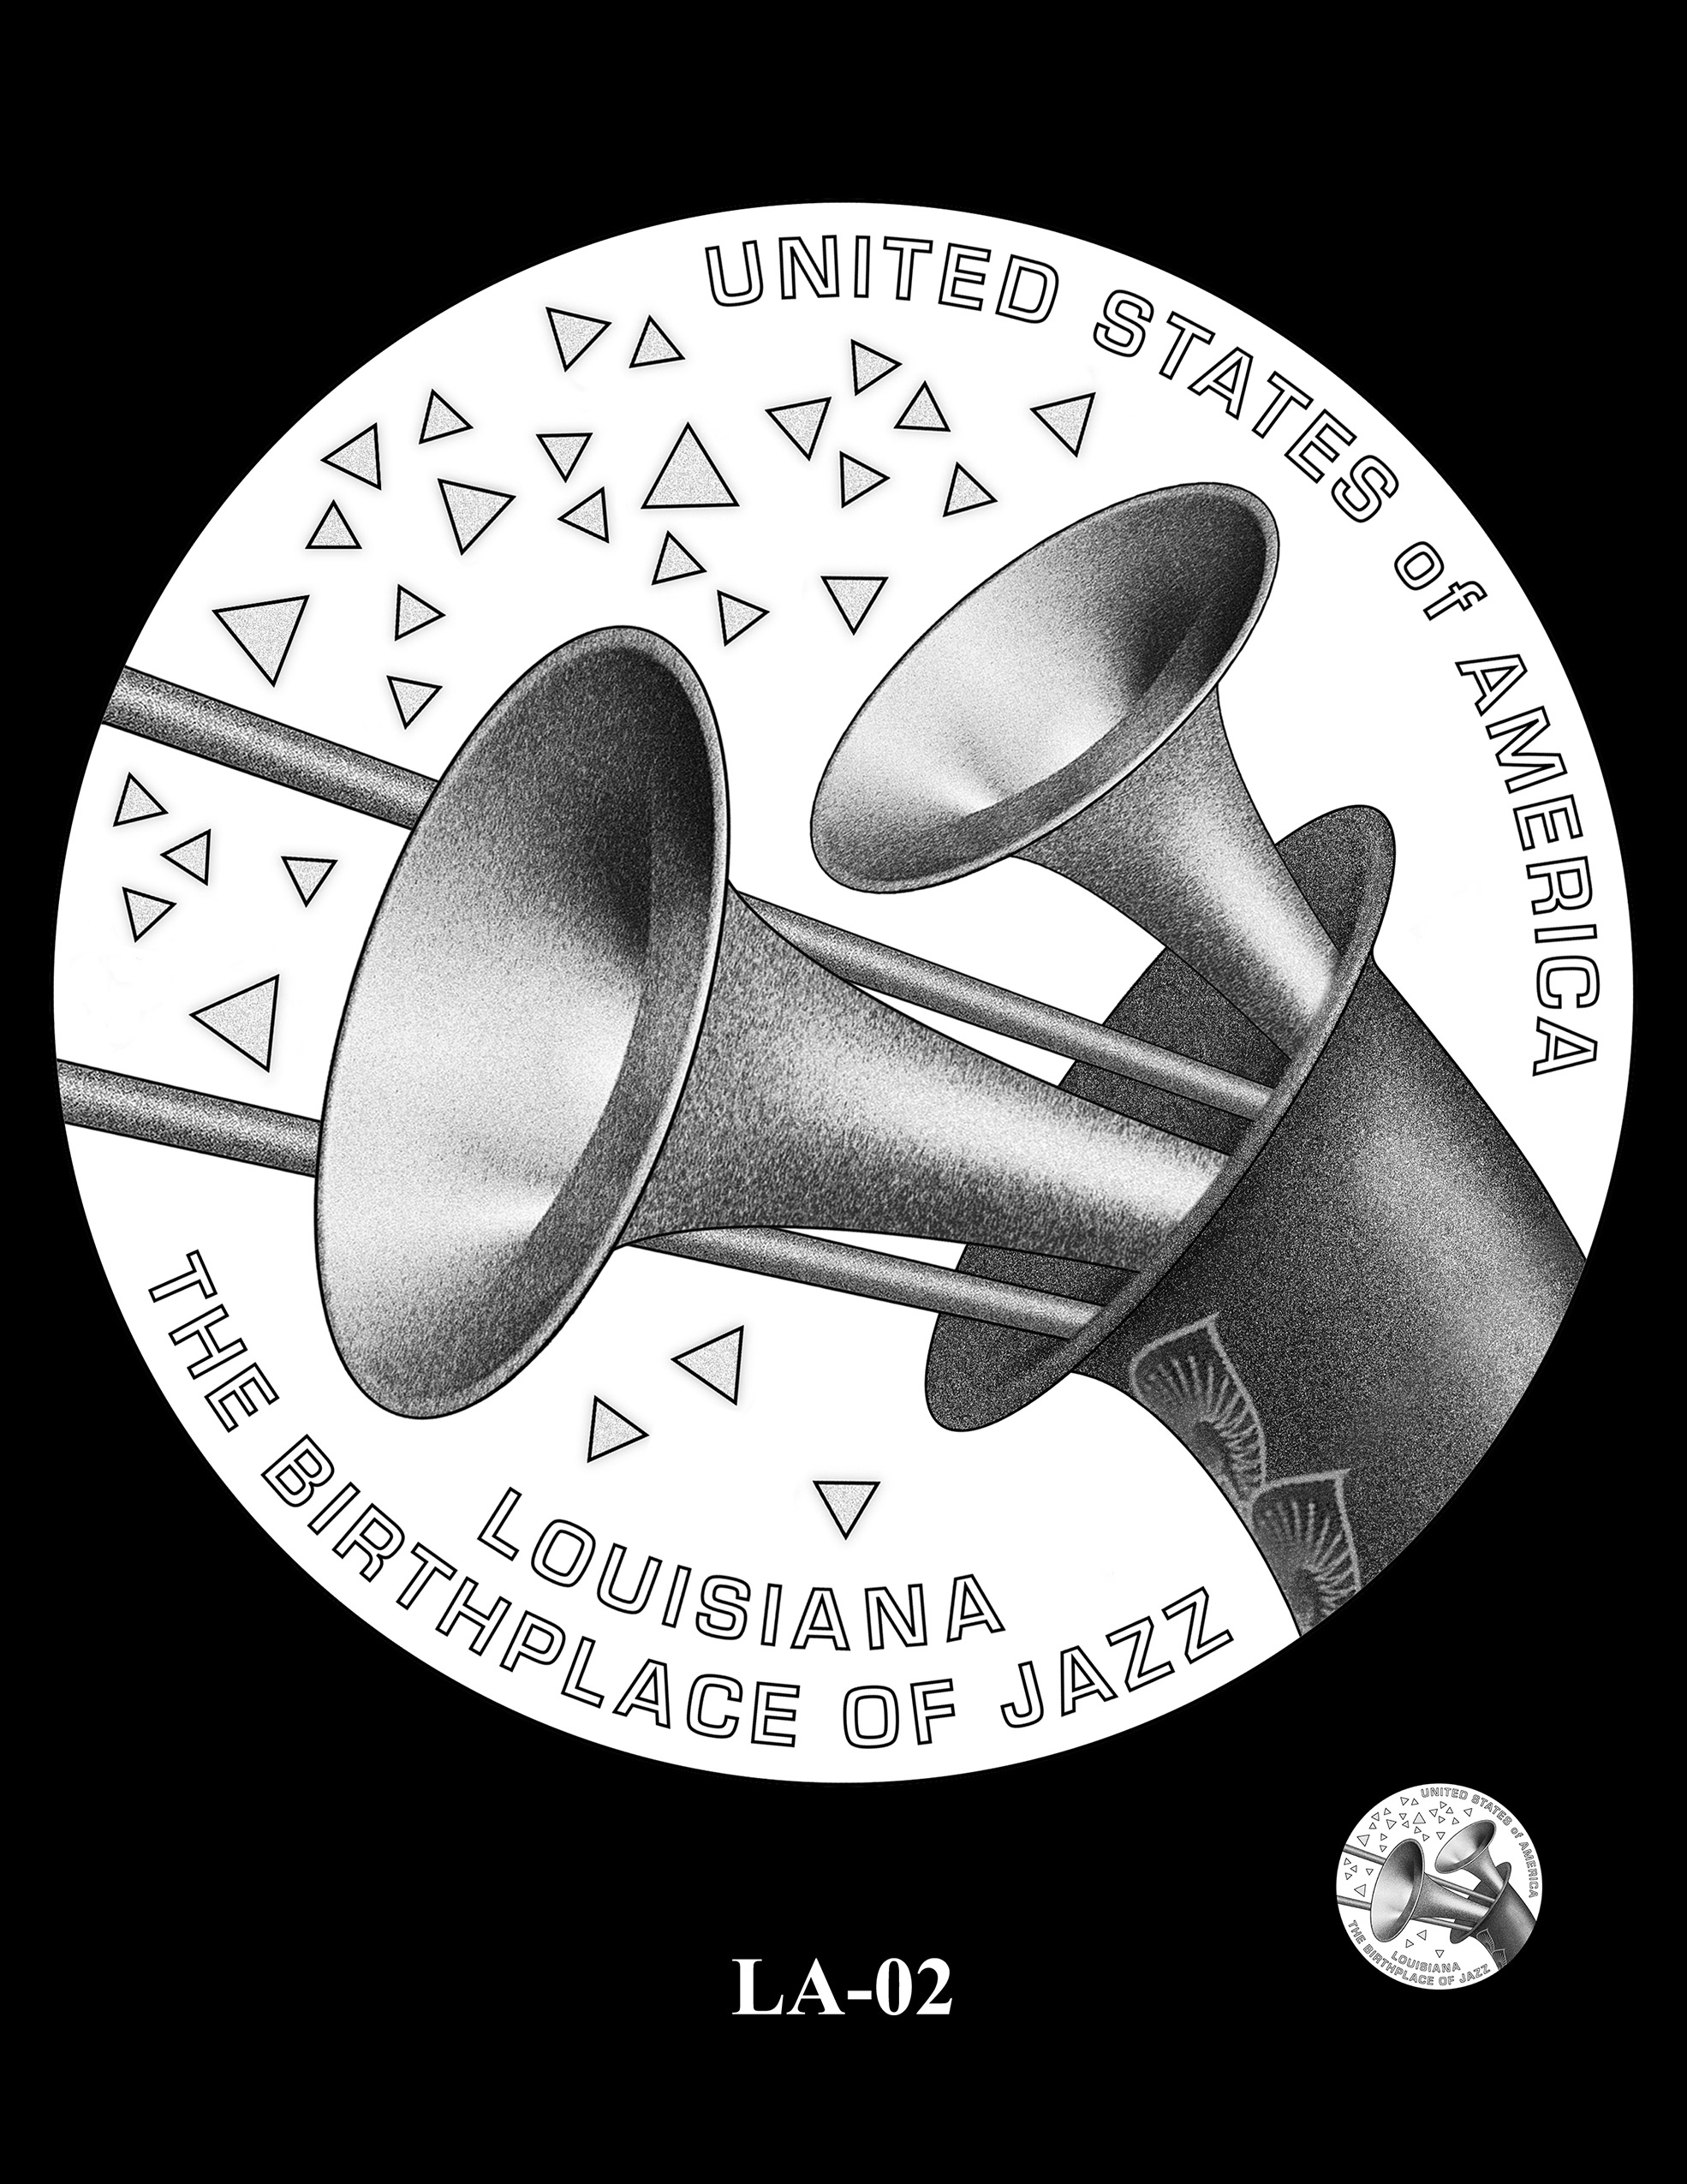 LA-02 -- 2023 American Innovation $1 Coin Program - Louisiana